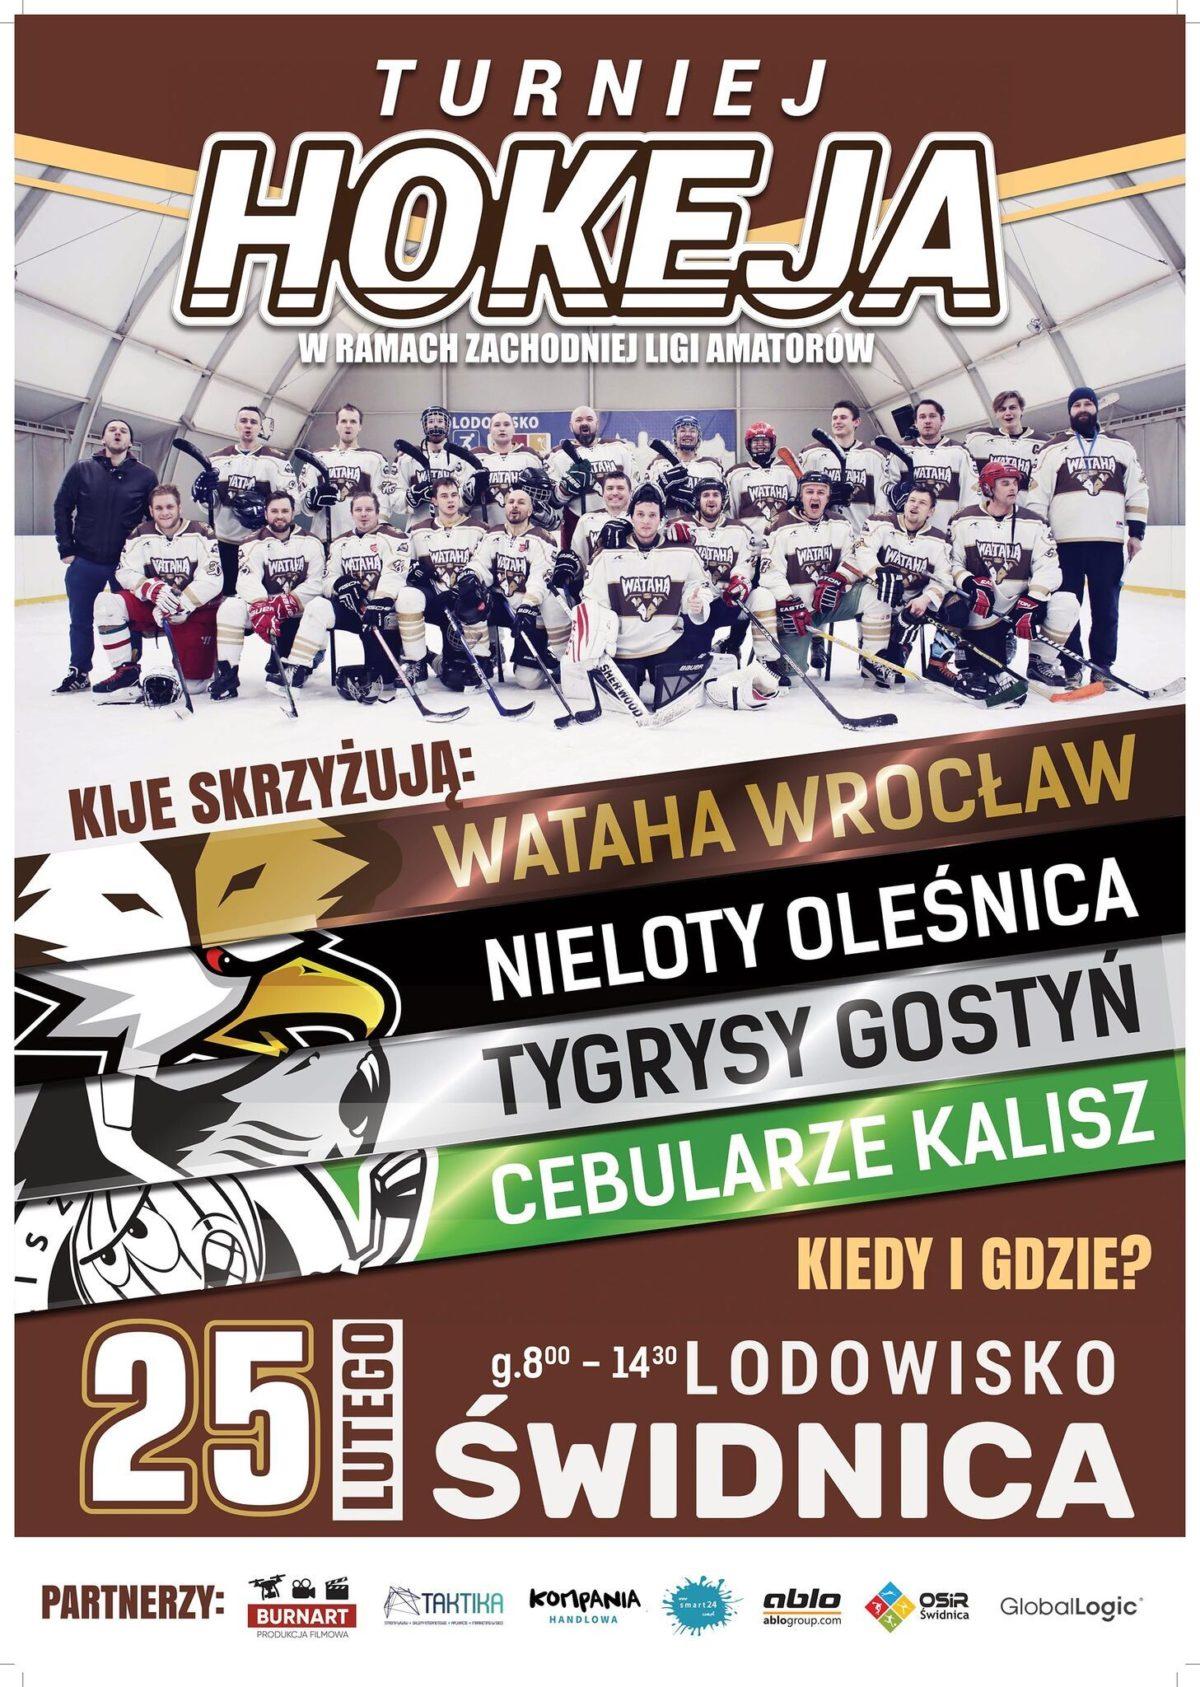 plakat turniej hokeja